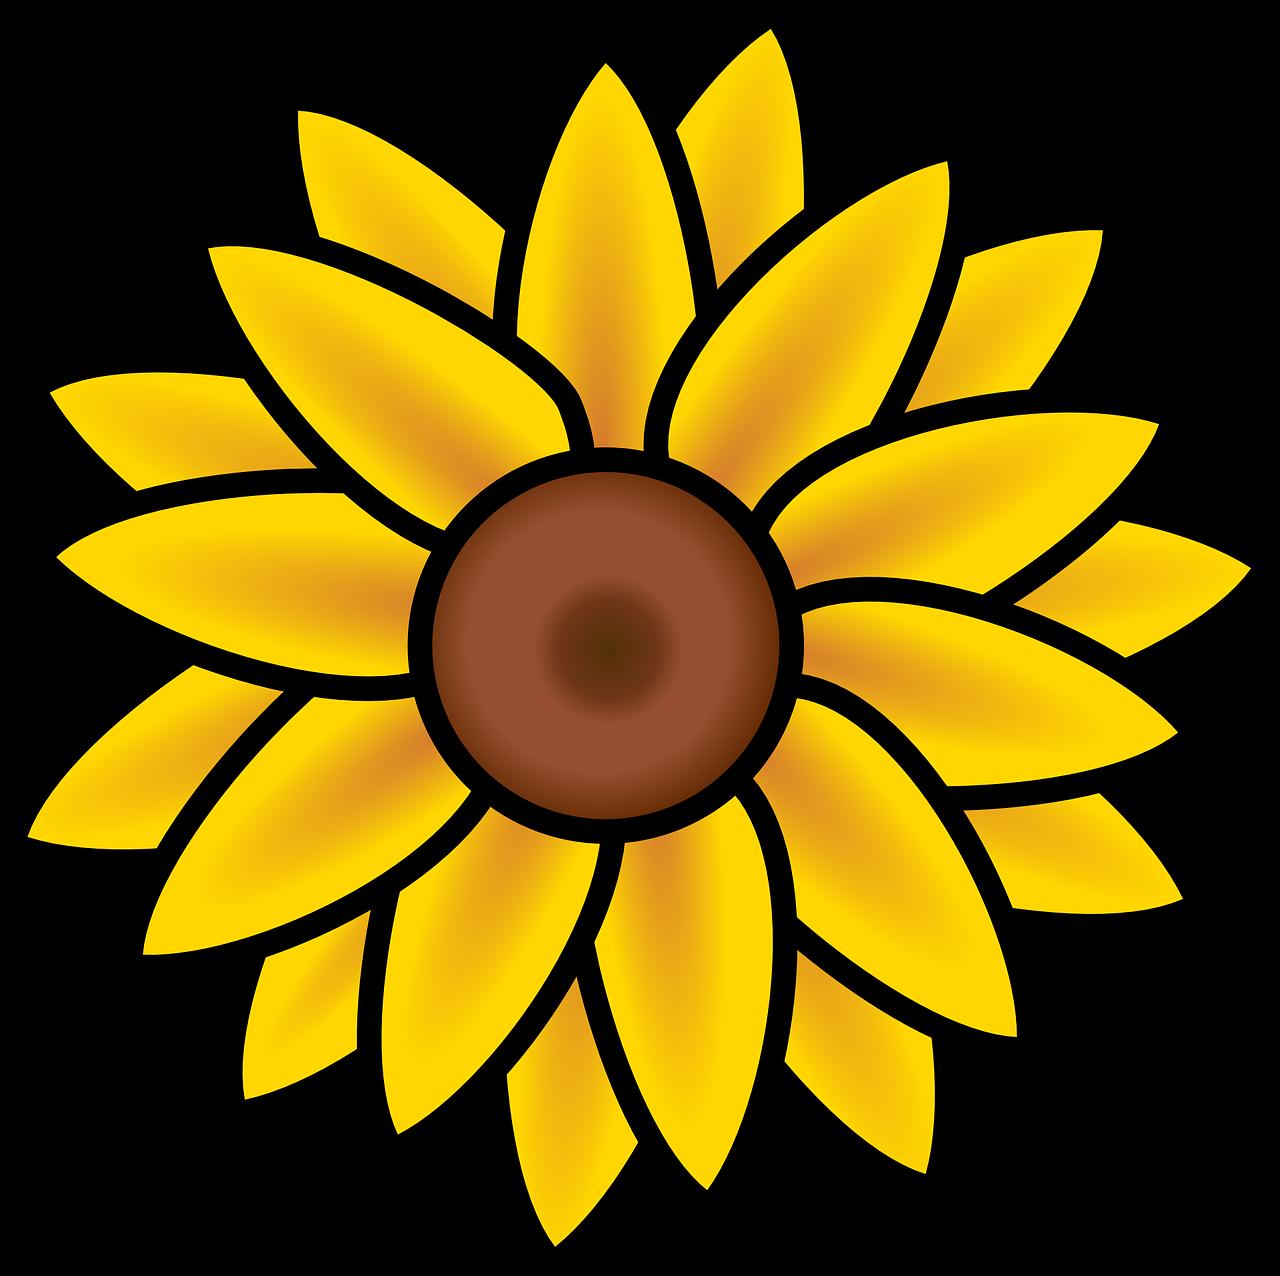 Banner Royalty Free Download Sunflower Clipart Gambar Bunga Matahari Kartun Png Download Full Size Clipart 89336 Pinclipart